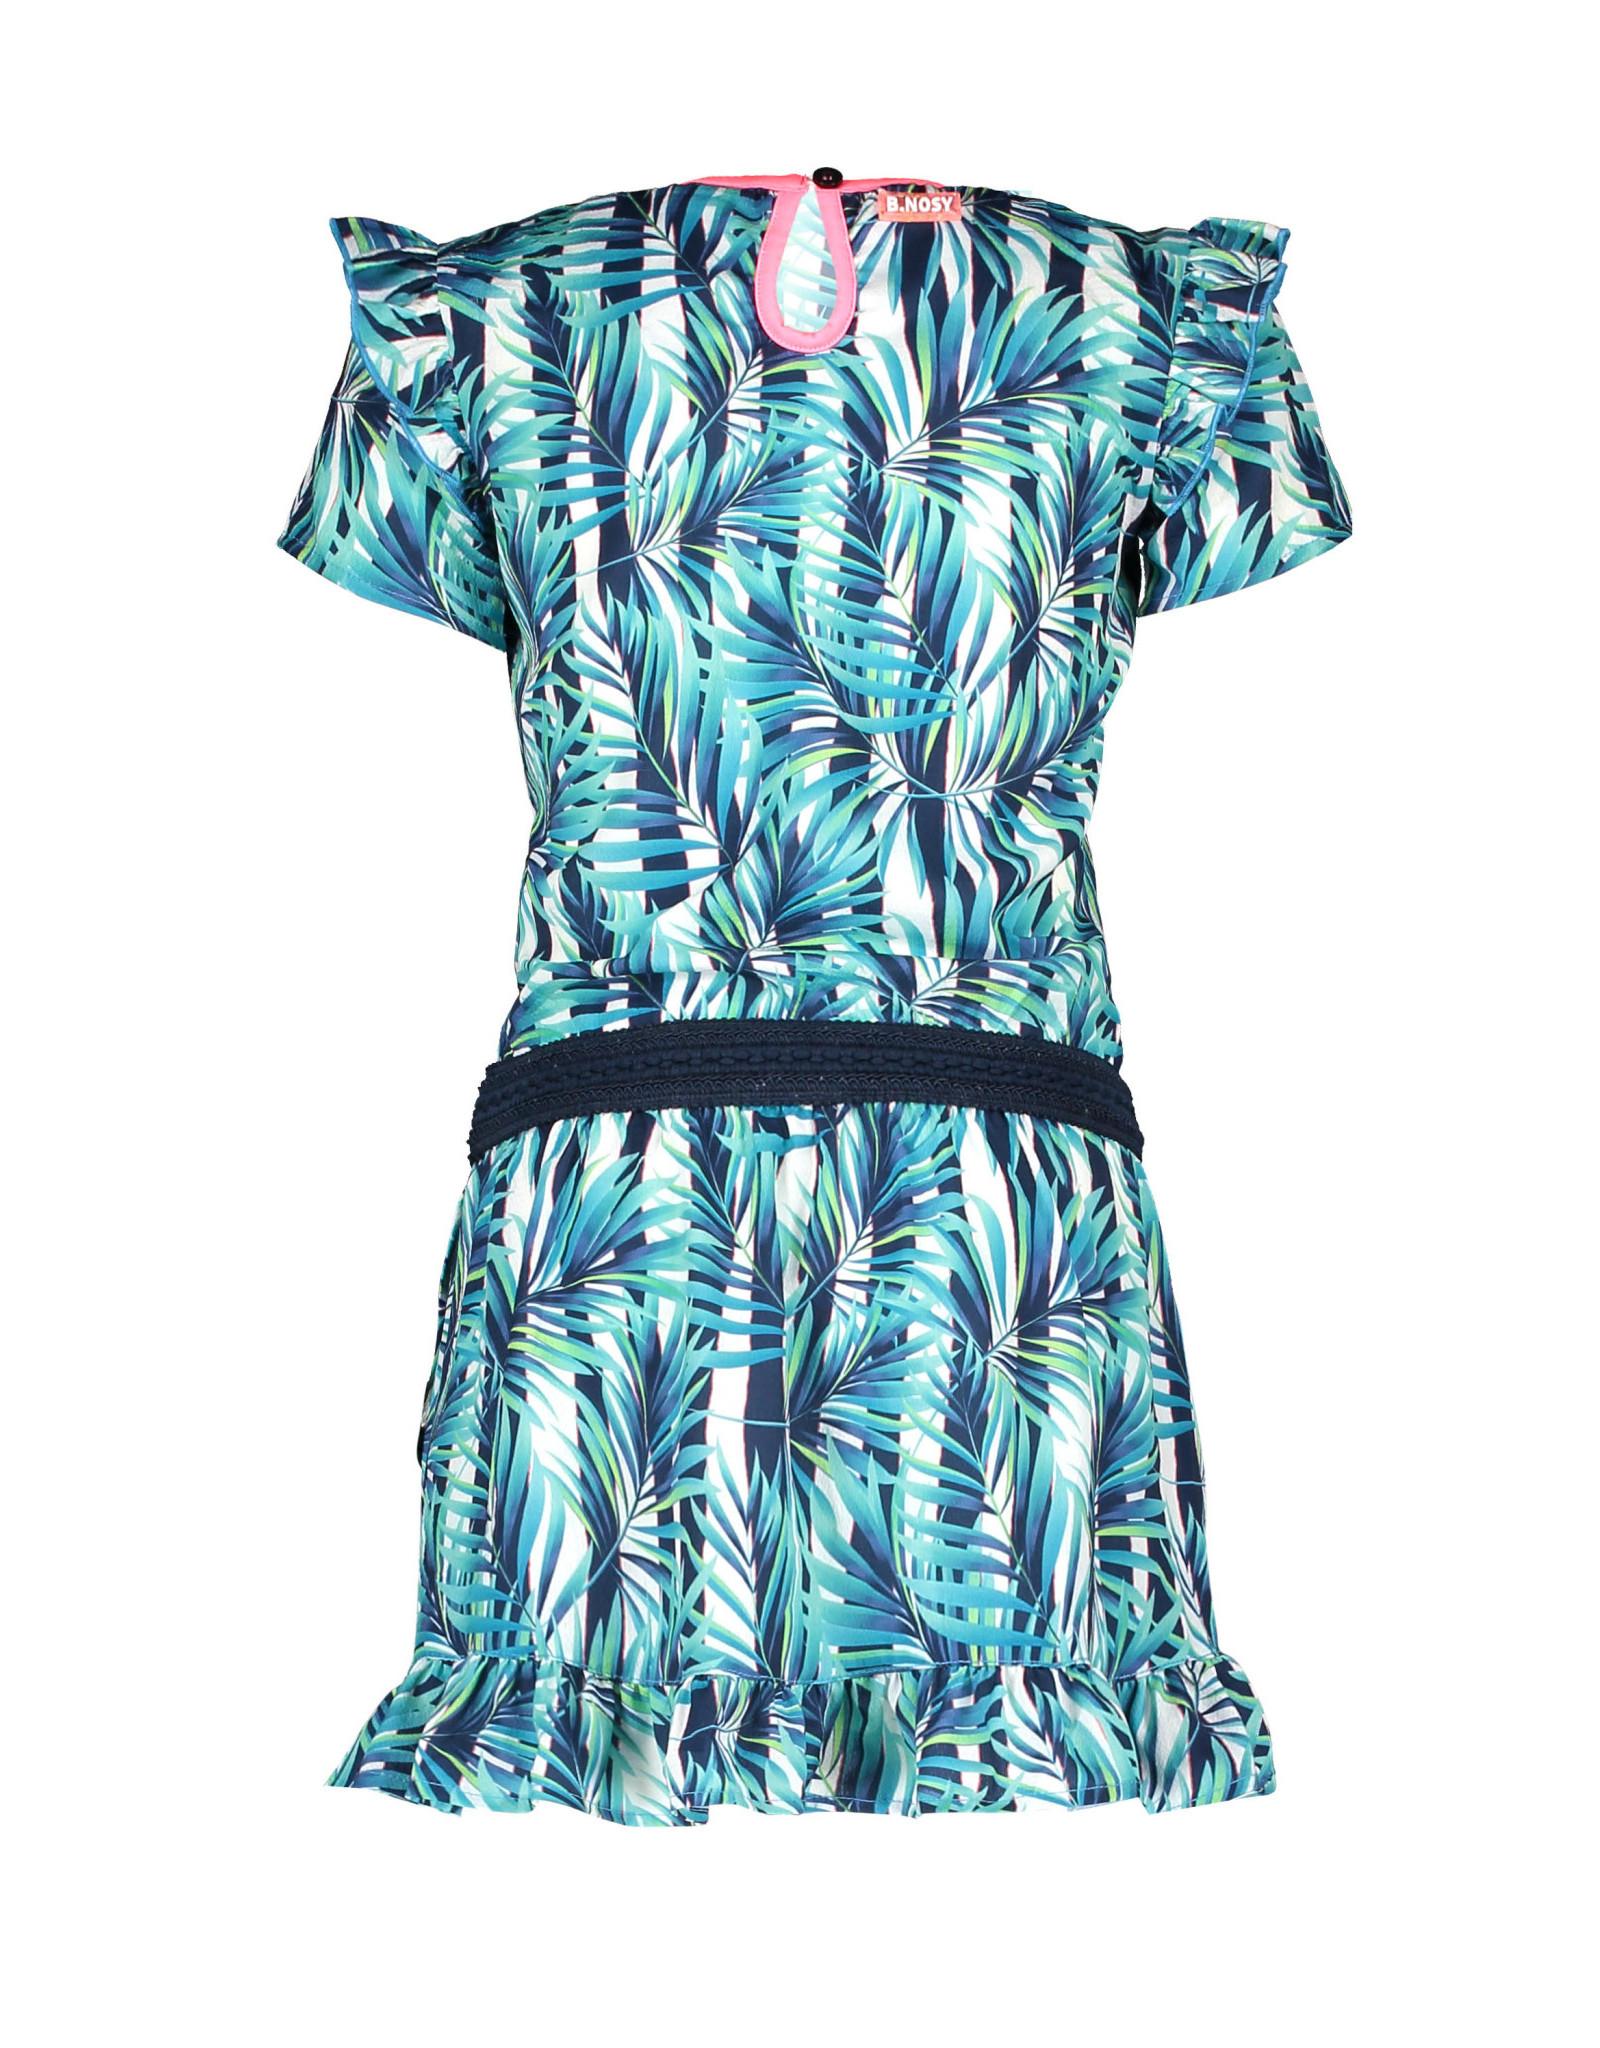 B-nosy Girls tropical palm ao dress with ruffle 331 Tropical palm ao